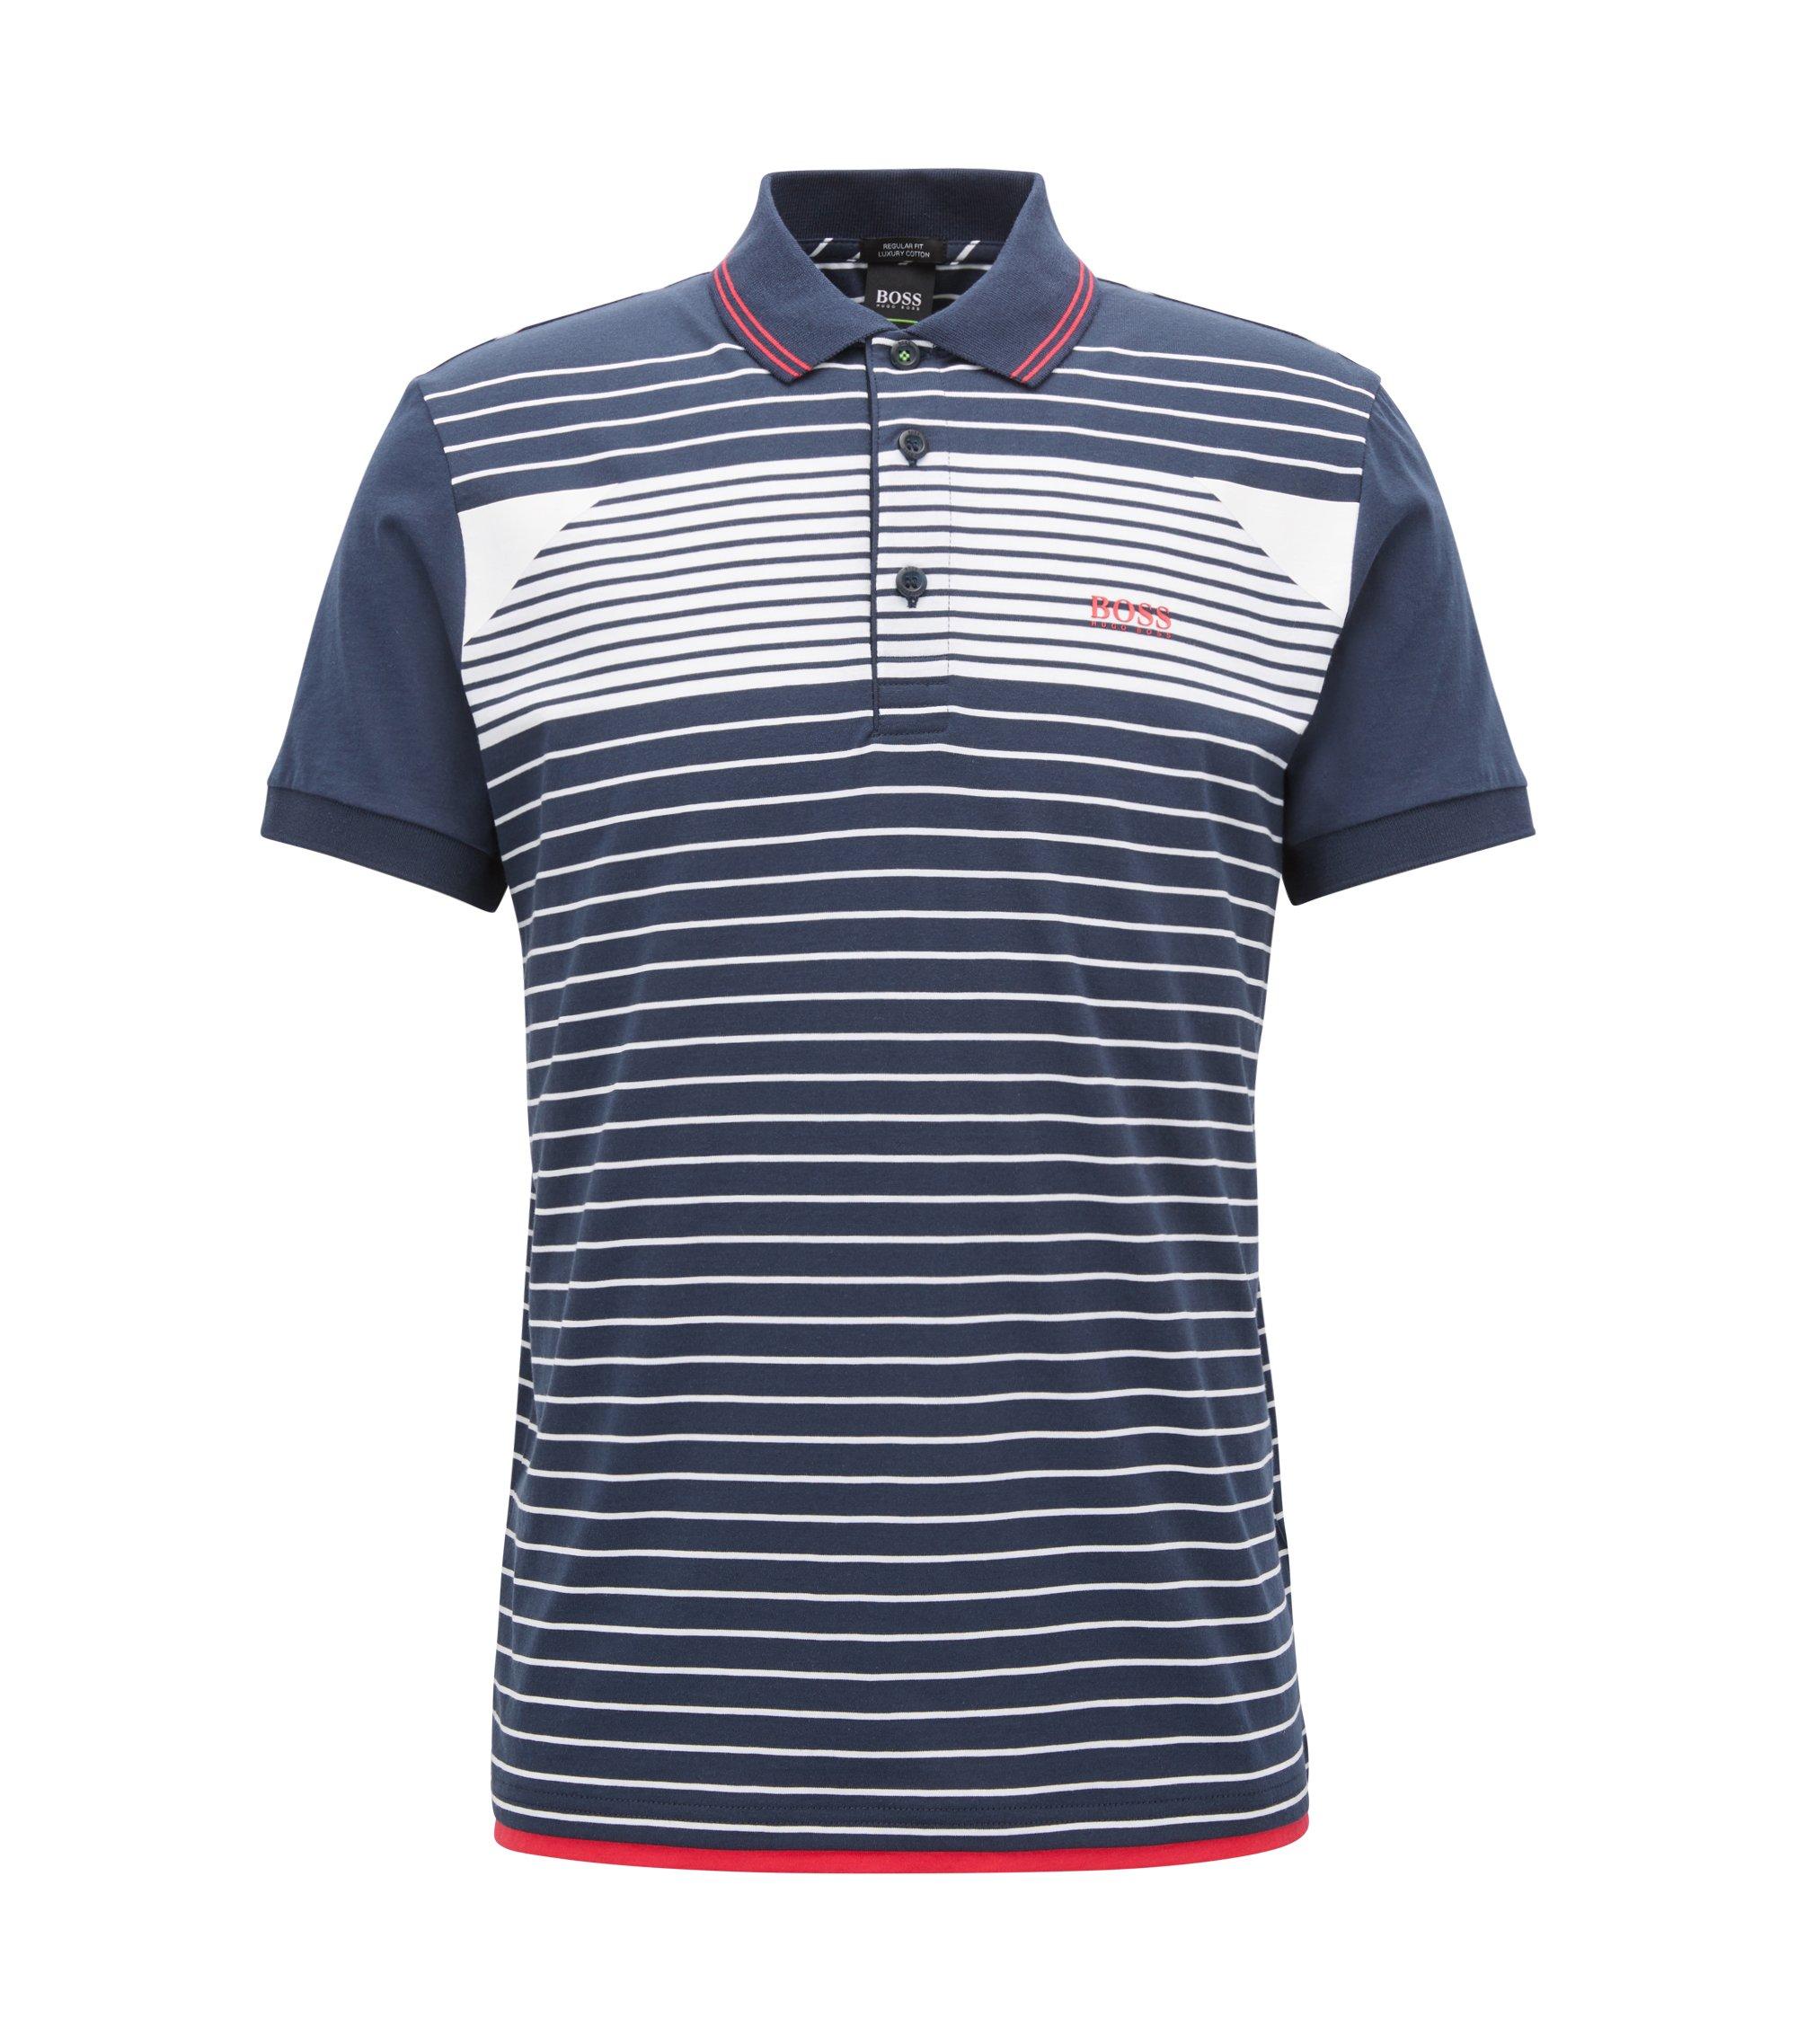 Polo en jersey de coton à rayures, Bleu foncé